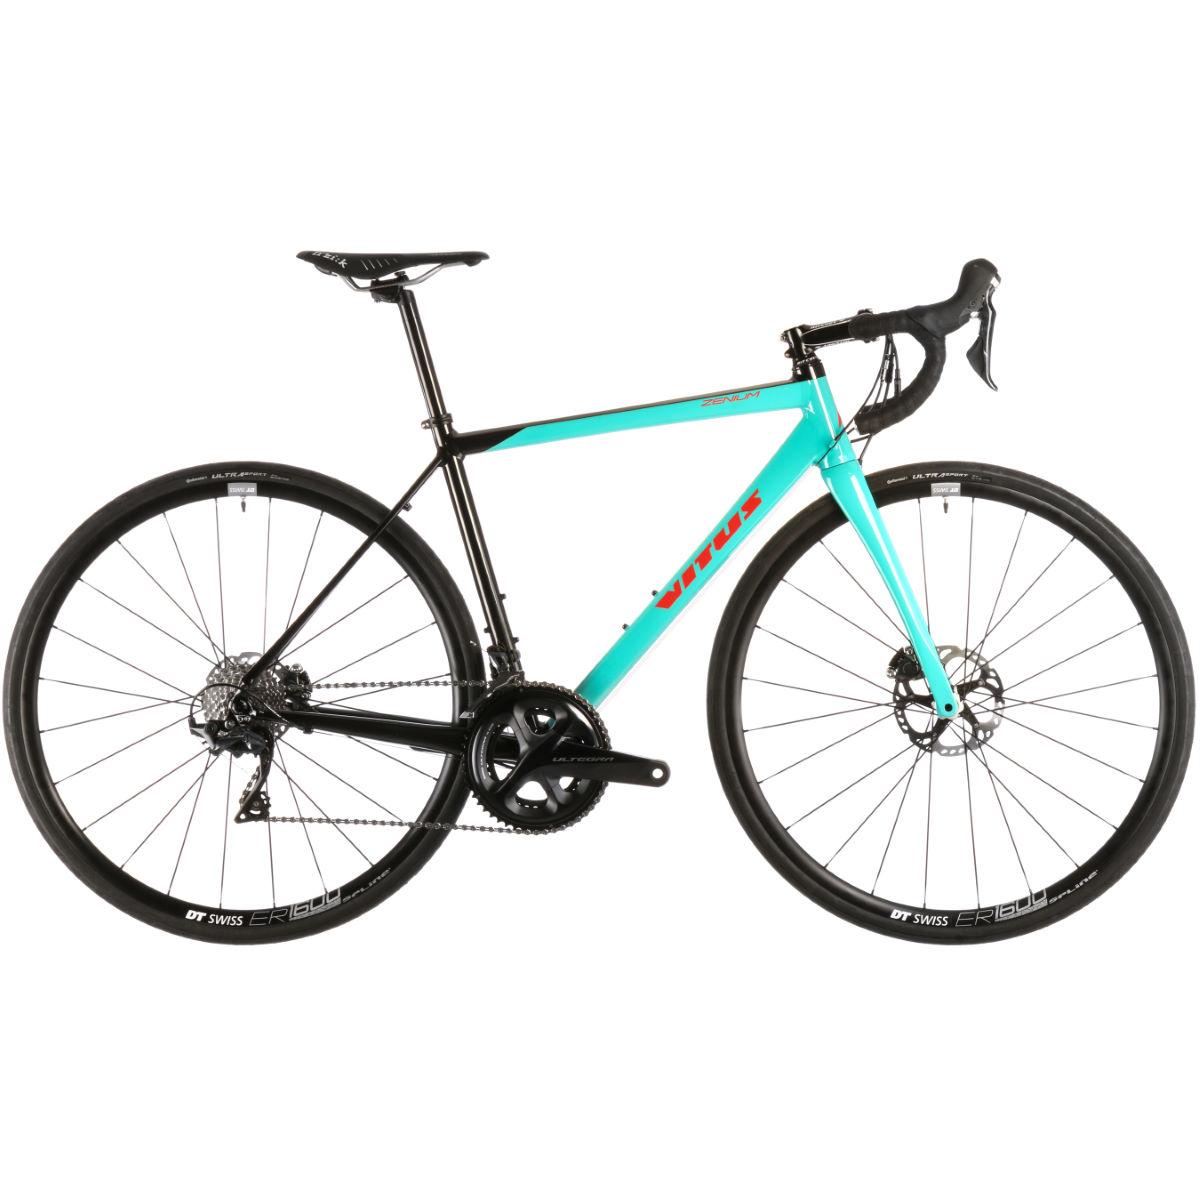 Vitus Zenium SL VRX Disc Ultegra Bikes